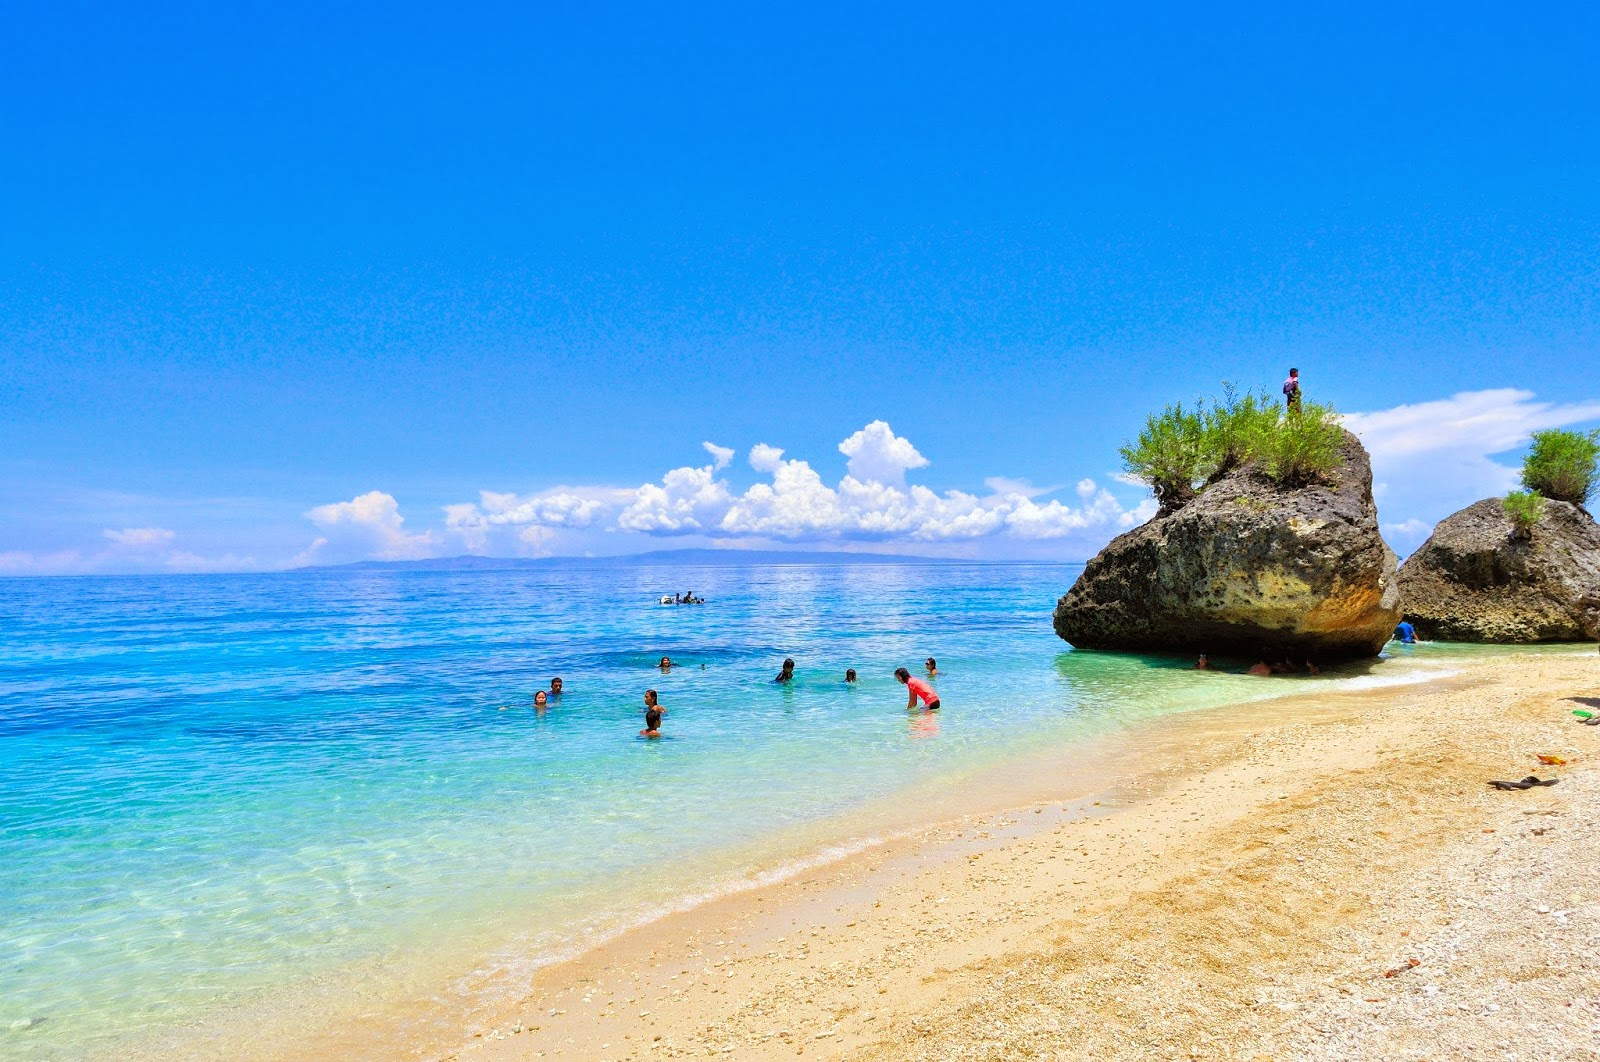 Public Beaches Near Cebu City